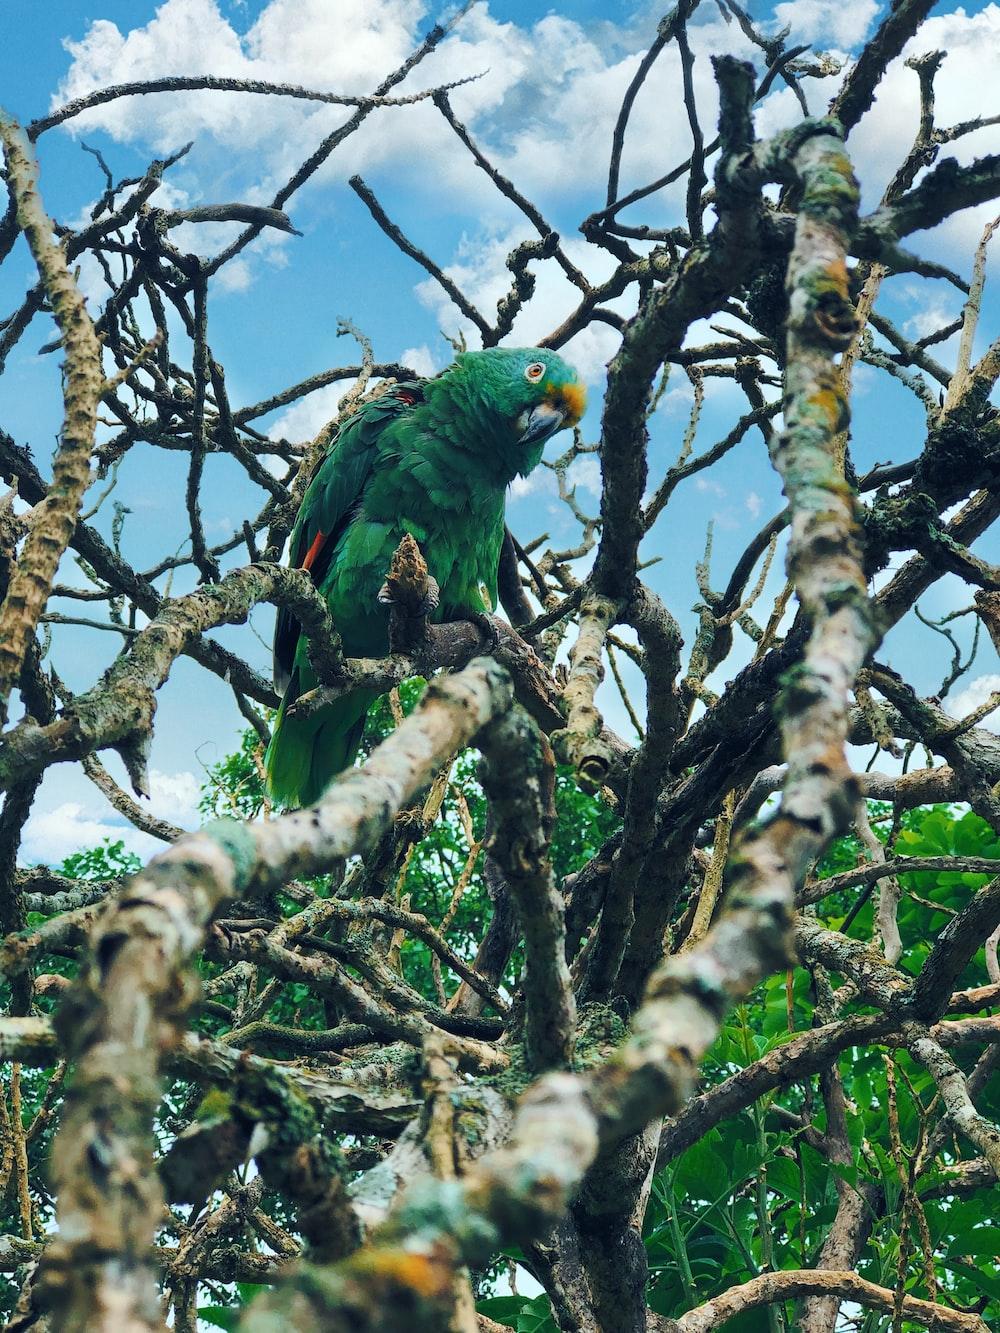 green parrot preaching tree